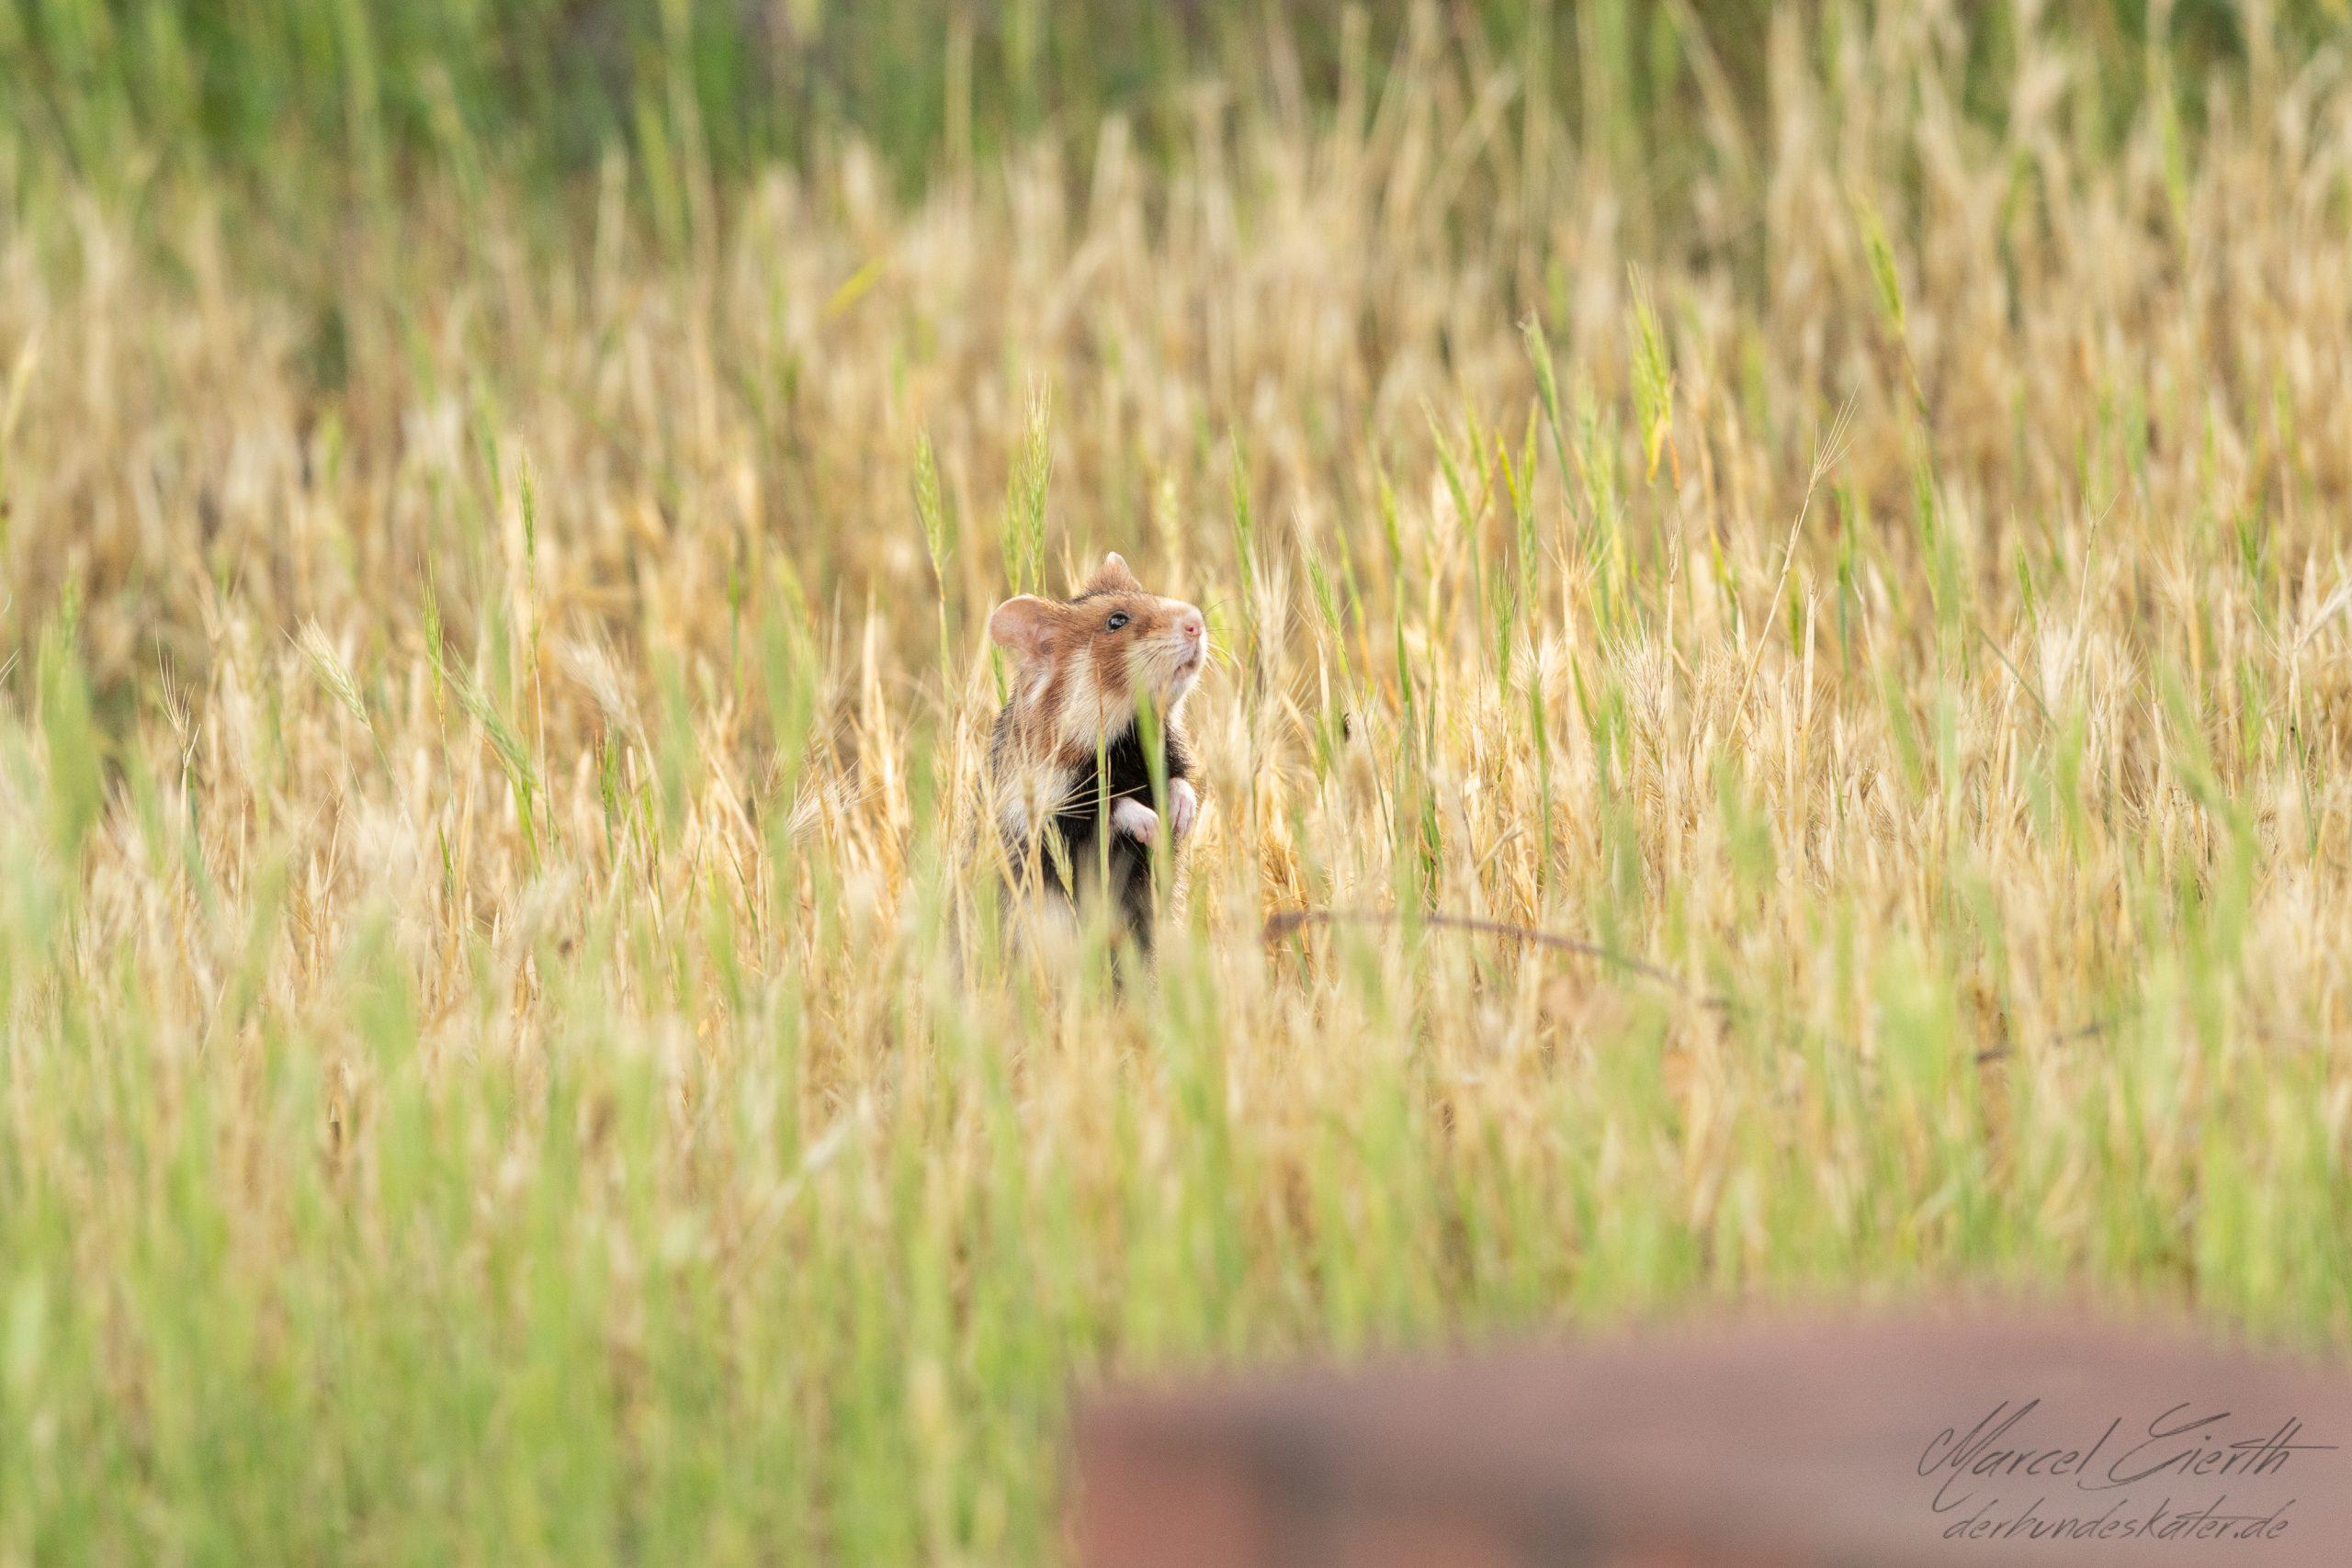 Hamster schaut aus Gras  - Fotograf Marcel Gierth